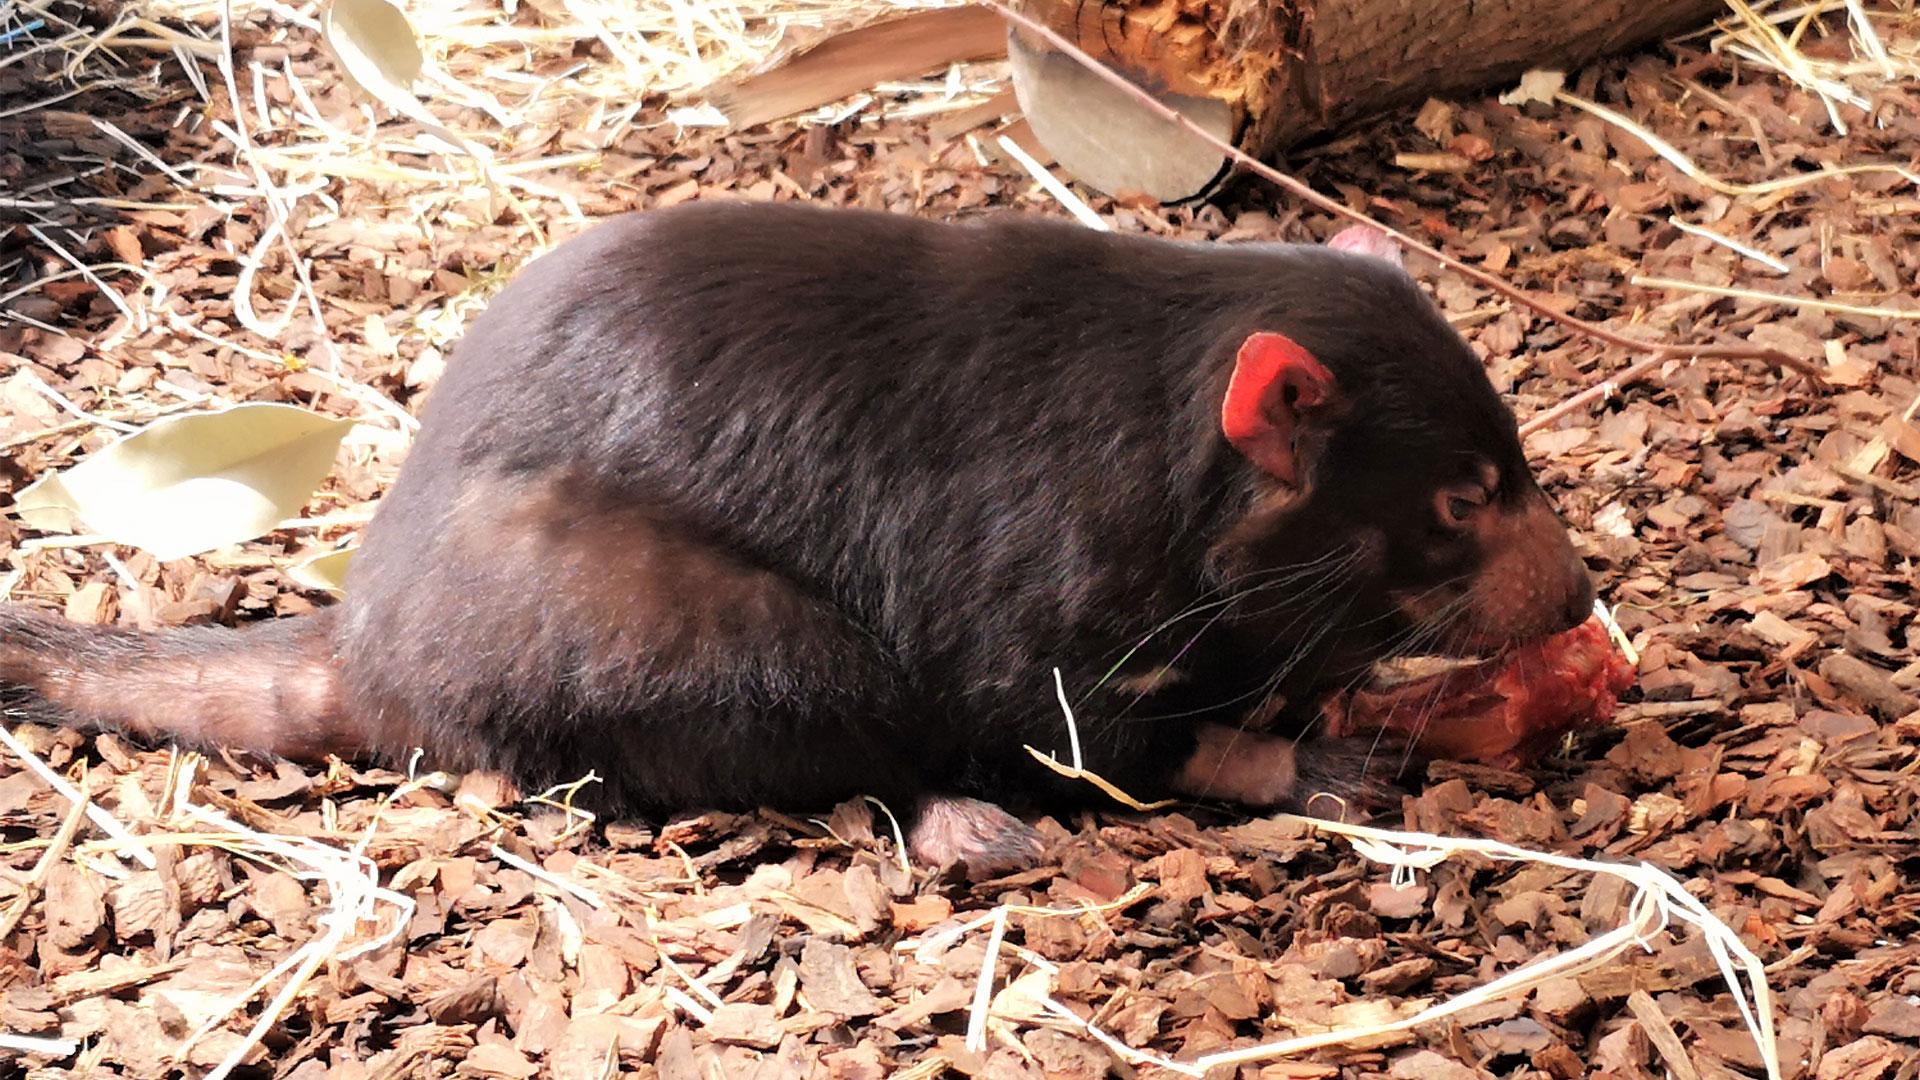 https://rfacdn.nz/zoo/assets/media/tasmanian-devil-dash-gallery-4.jpg